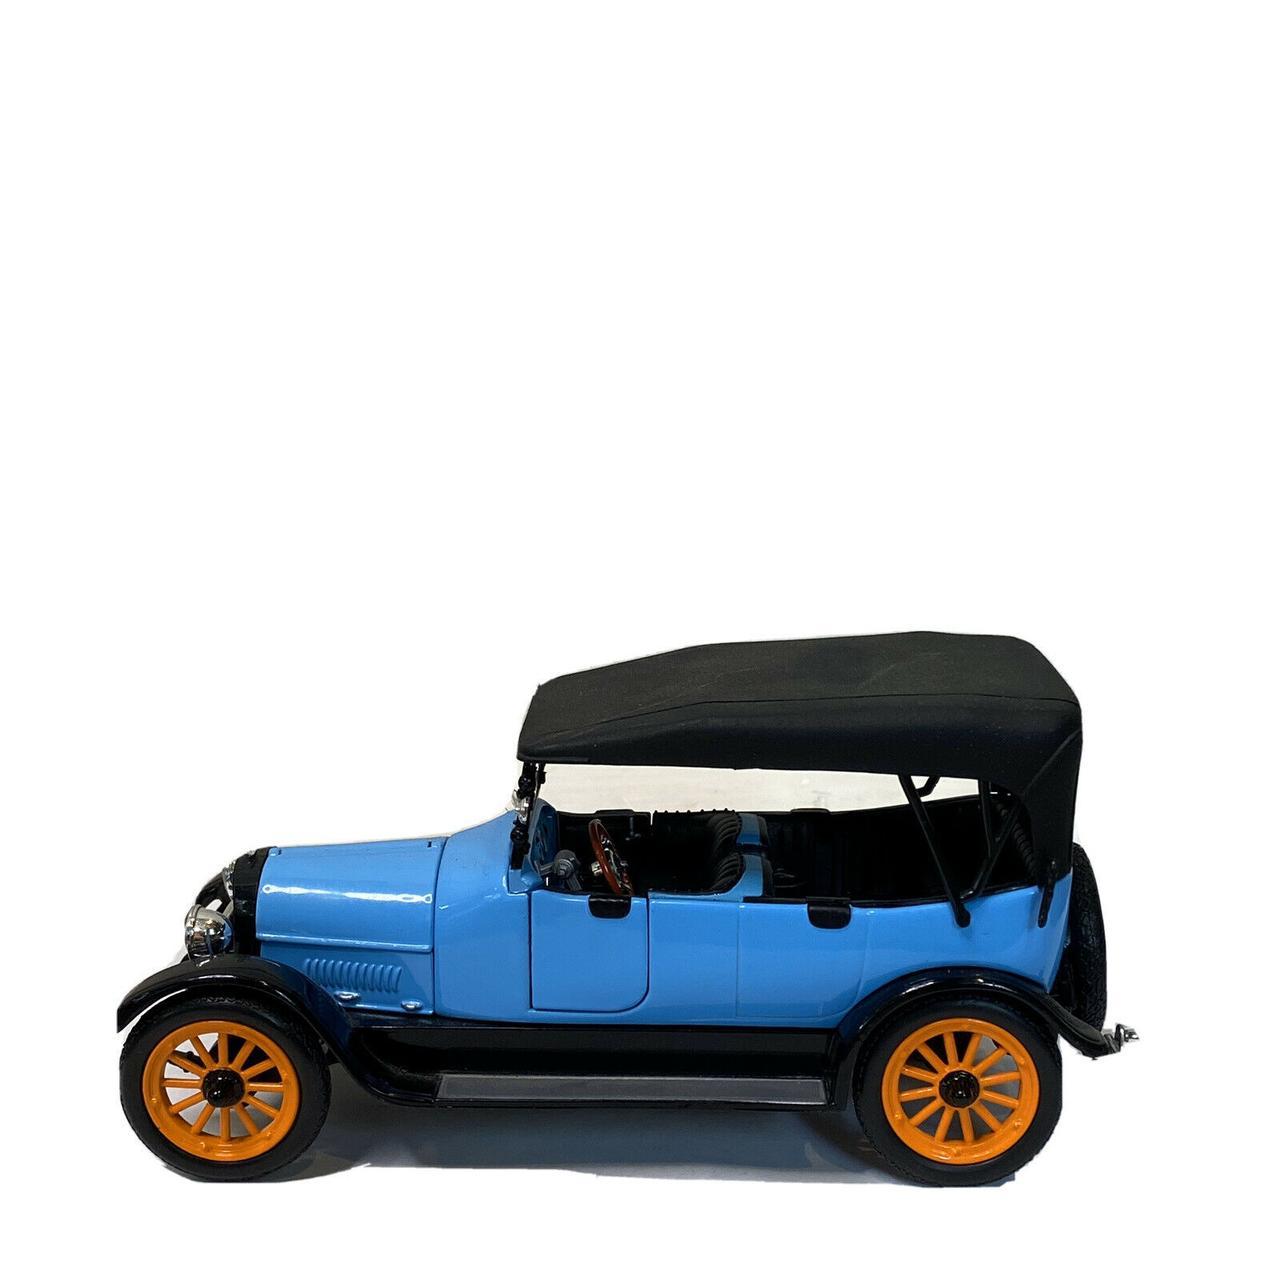 1/18 Signature Коллекционная модель REO Touring, 1917 года - фото 1